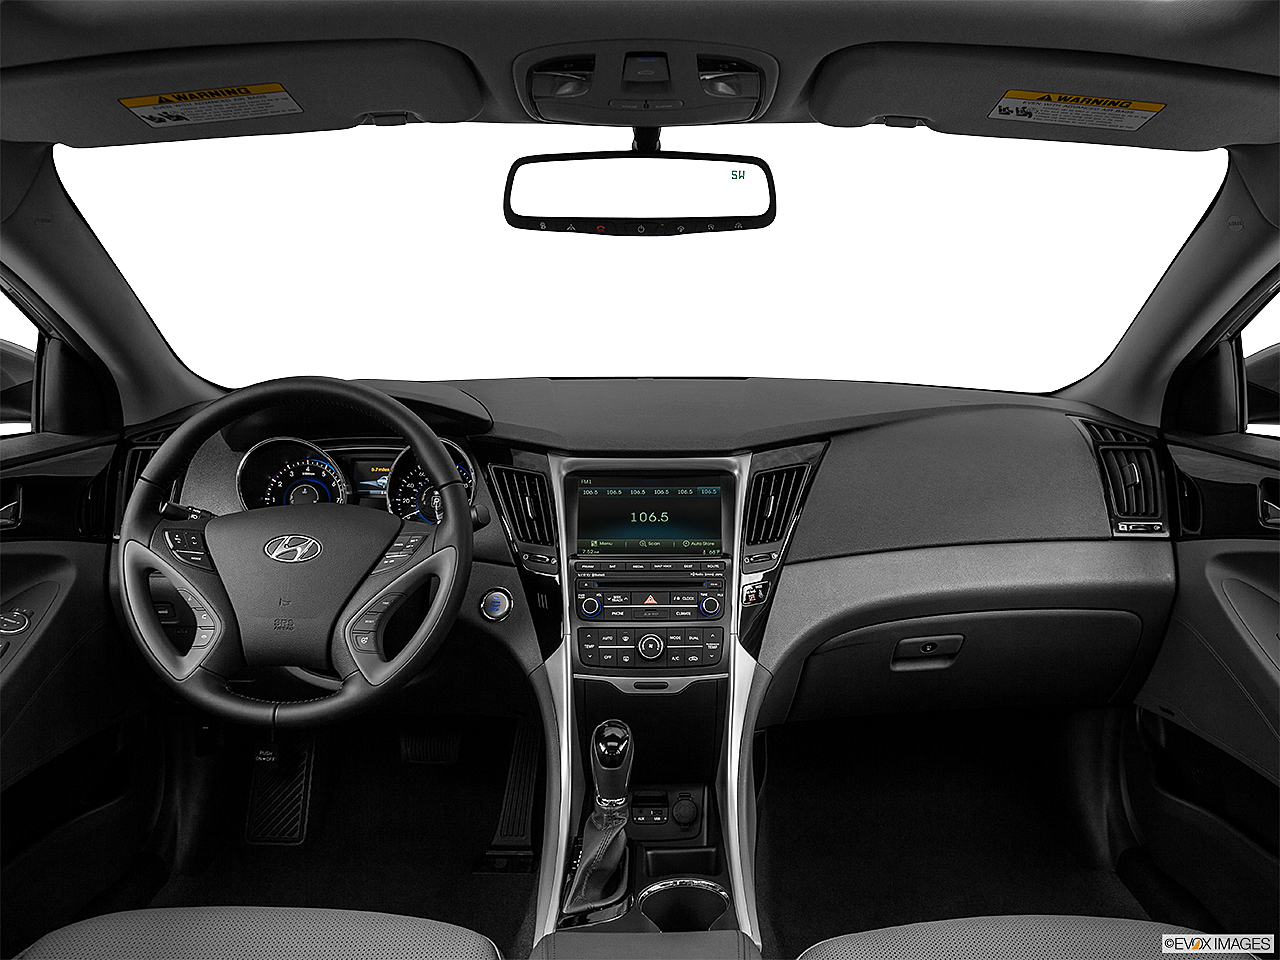 2014 Hyundai Sonata Limited 4dr Sedan PZEV - Research